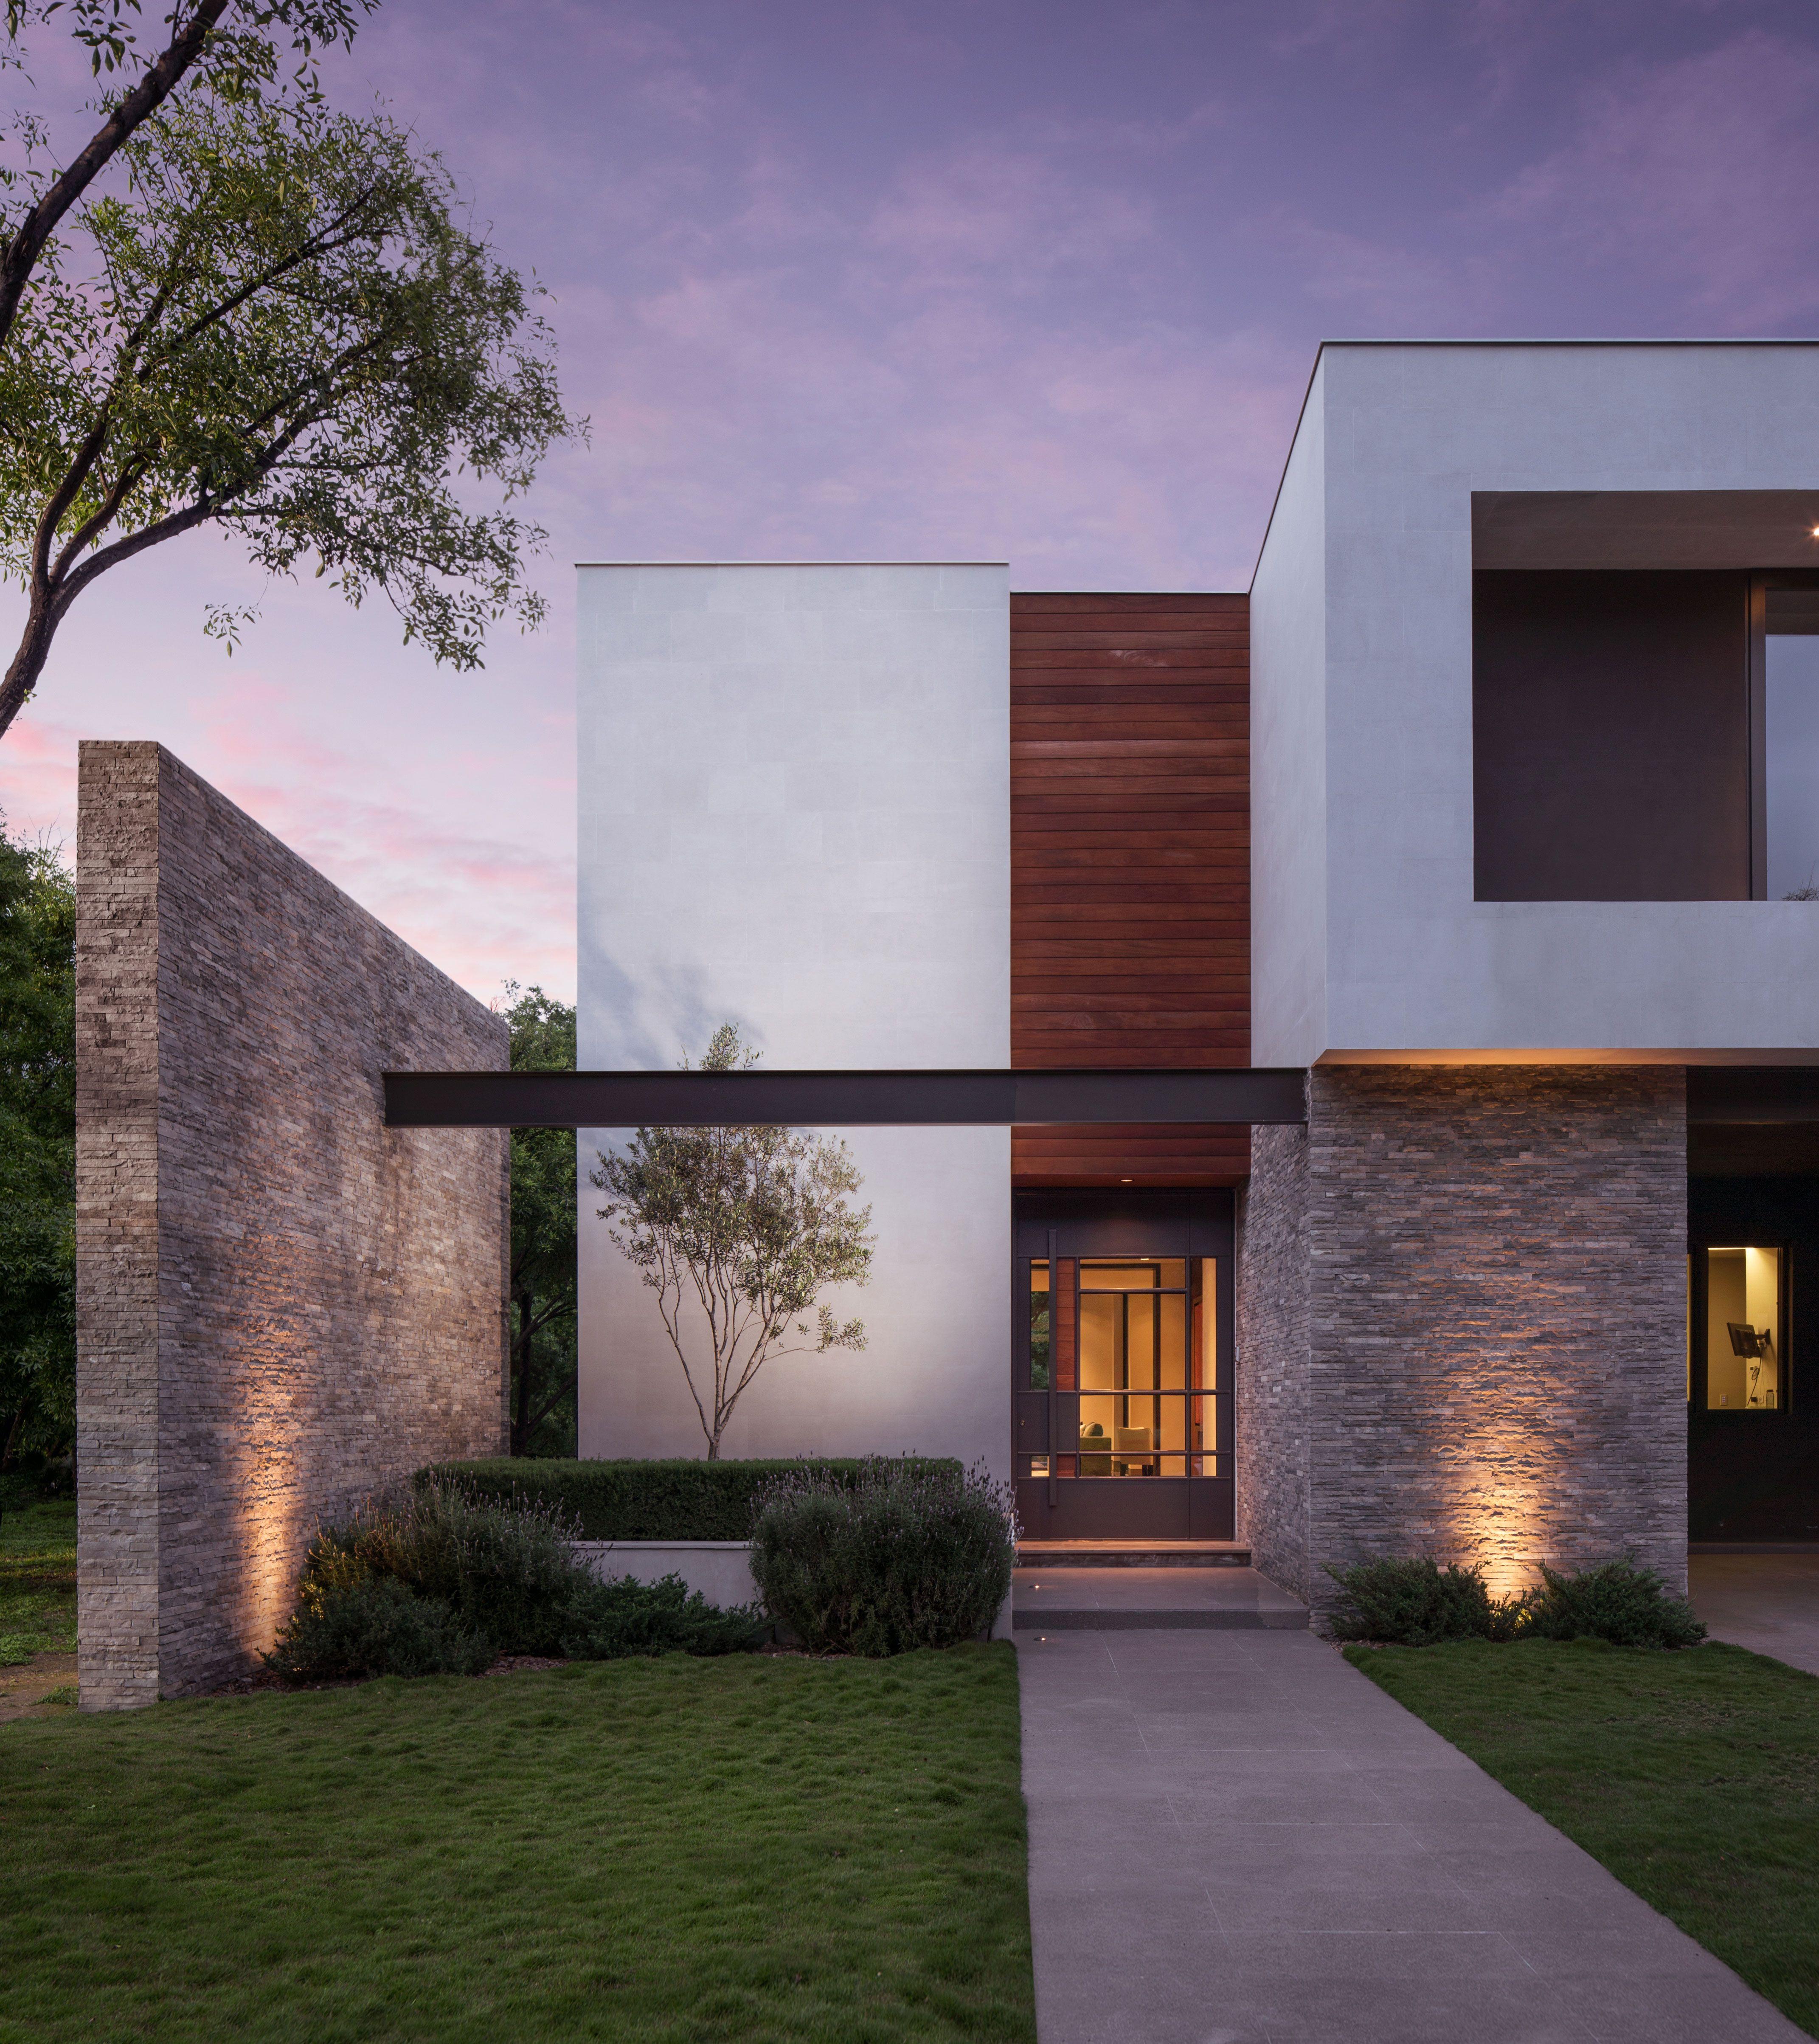 Architecture architect house pozas arquitectos home style arquitectura pinterest - Arquitectos casas modernas ...